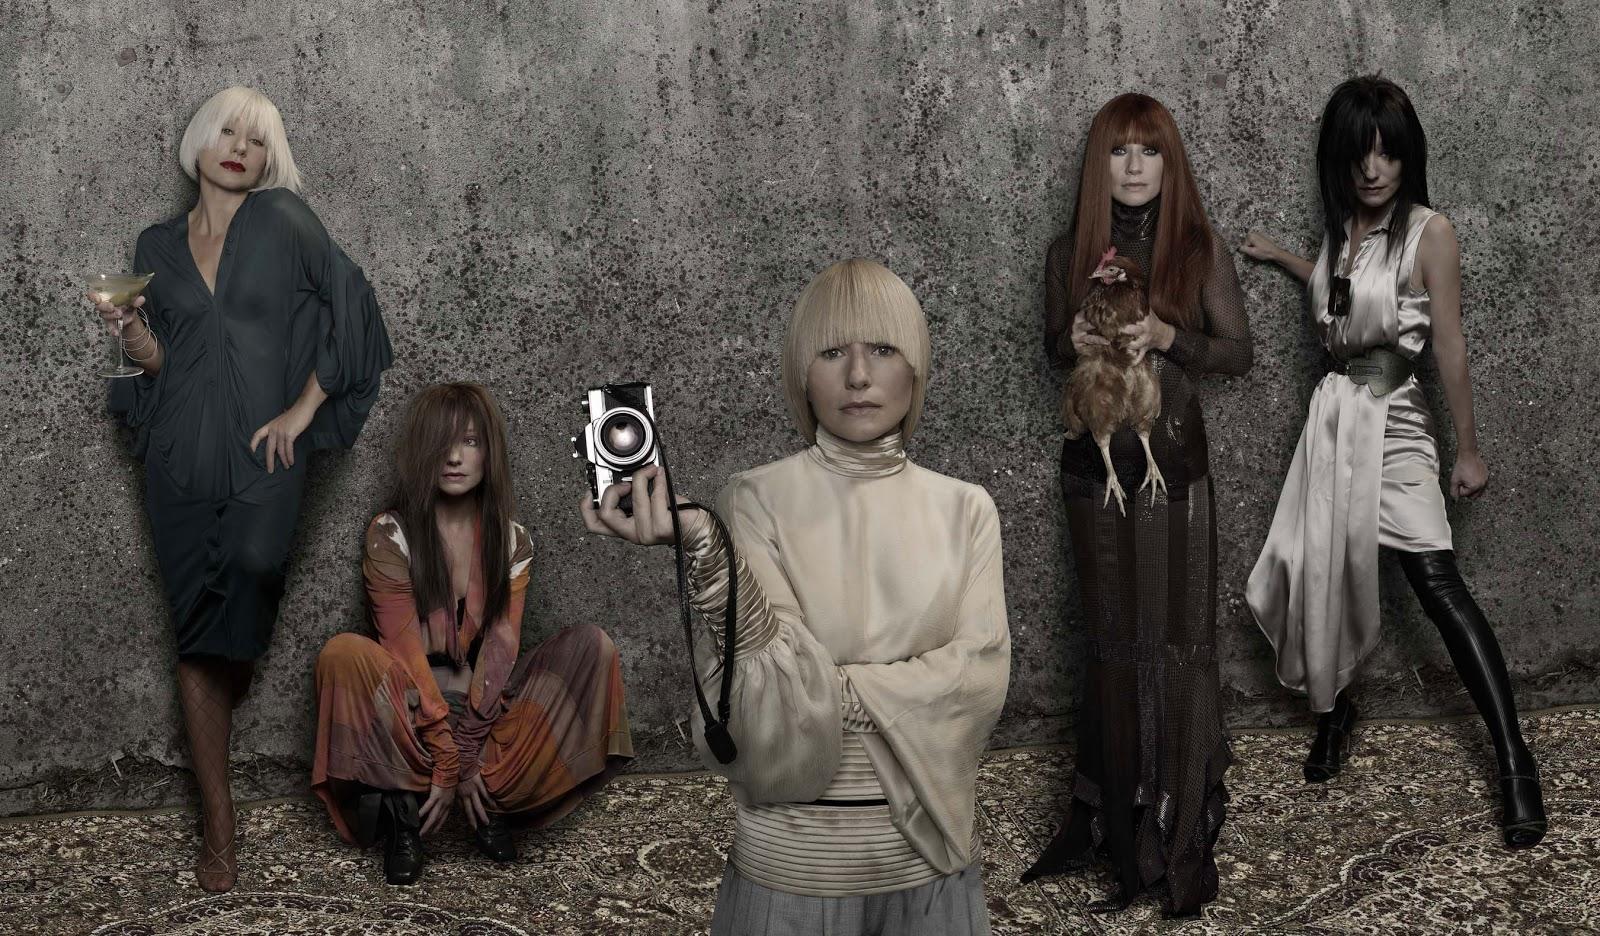 http://1.bp.blogspot.com/-KUVgtrAUbzo/ULtxUzn_-6I/AAAAAAAAktQ/d4urW94en6s/s1600/tori-amos-american-doll-posse.jpg